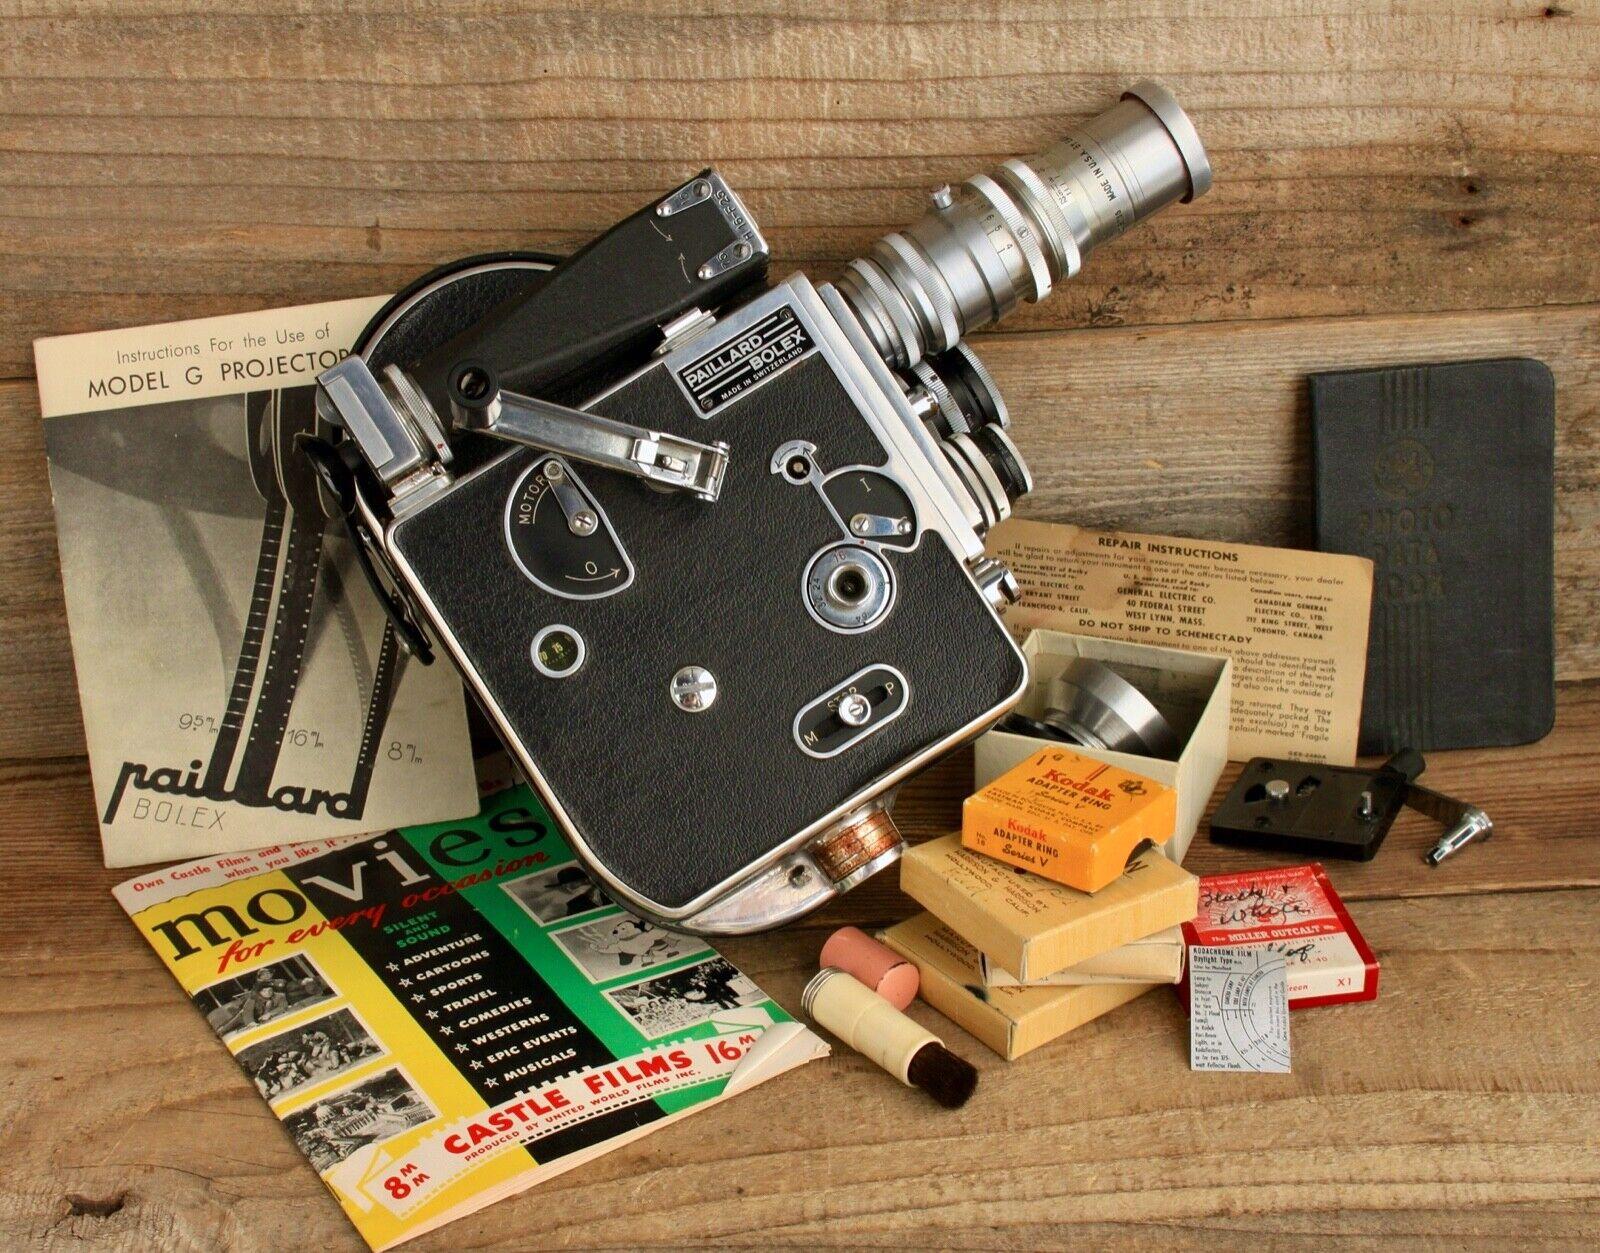 Vintage Pallard Bolex H-16mm Movie Camera  - $455.00